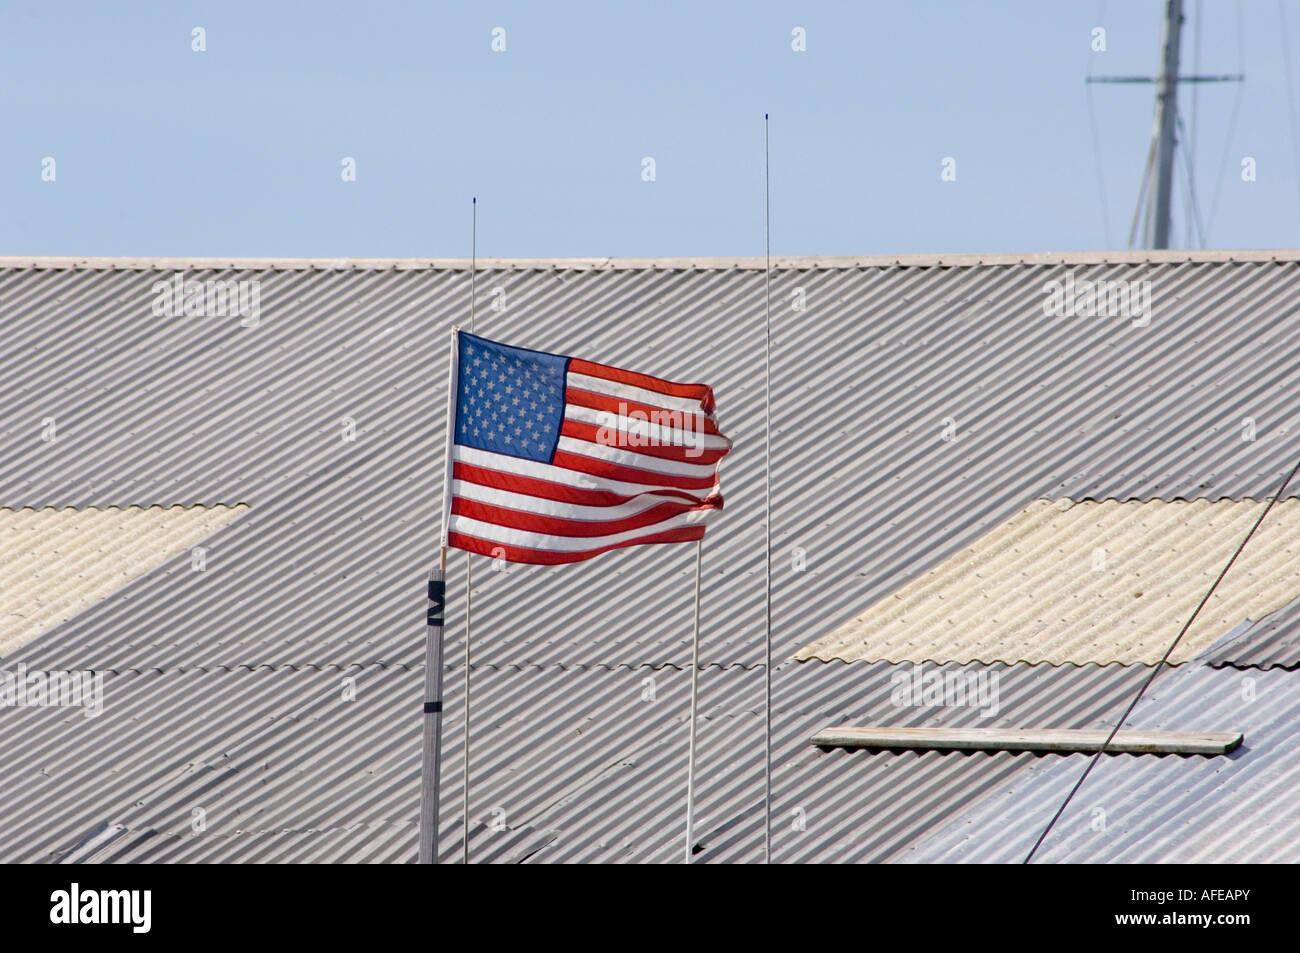 american flag at a marina in newport rhode island - Stock Image